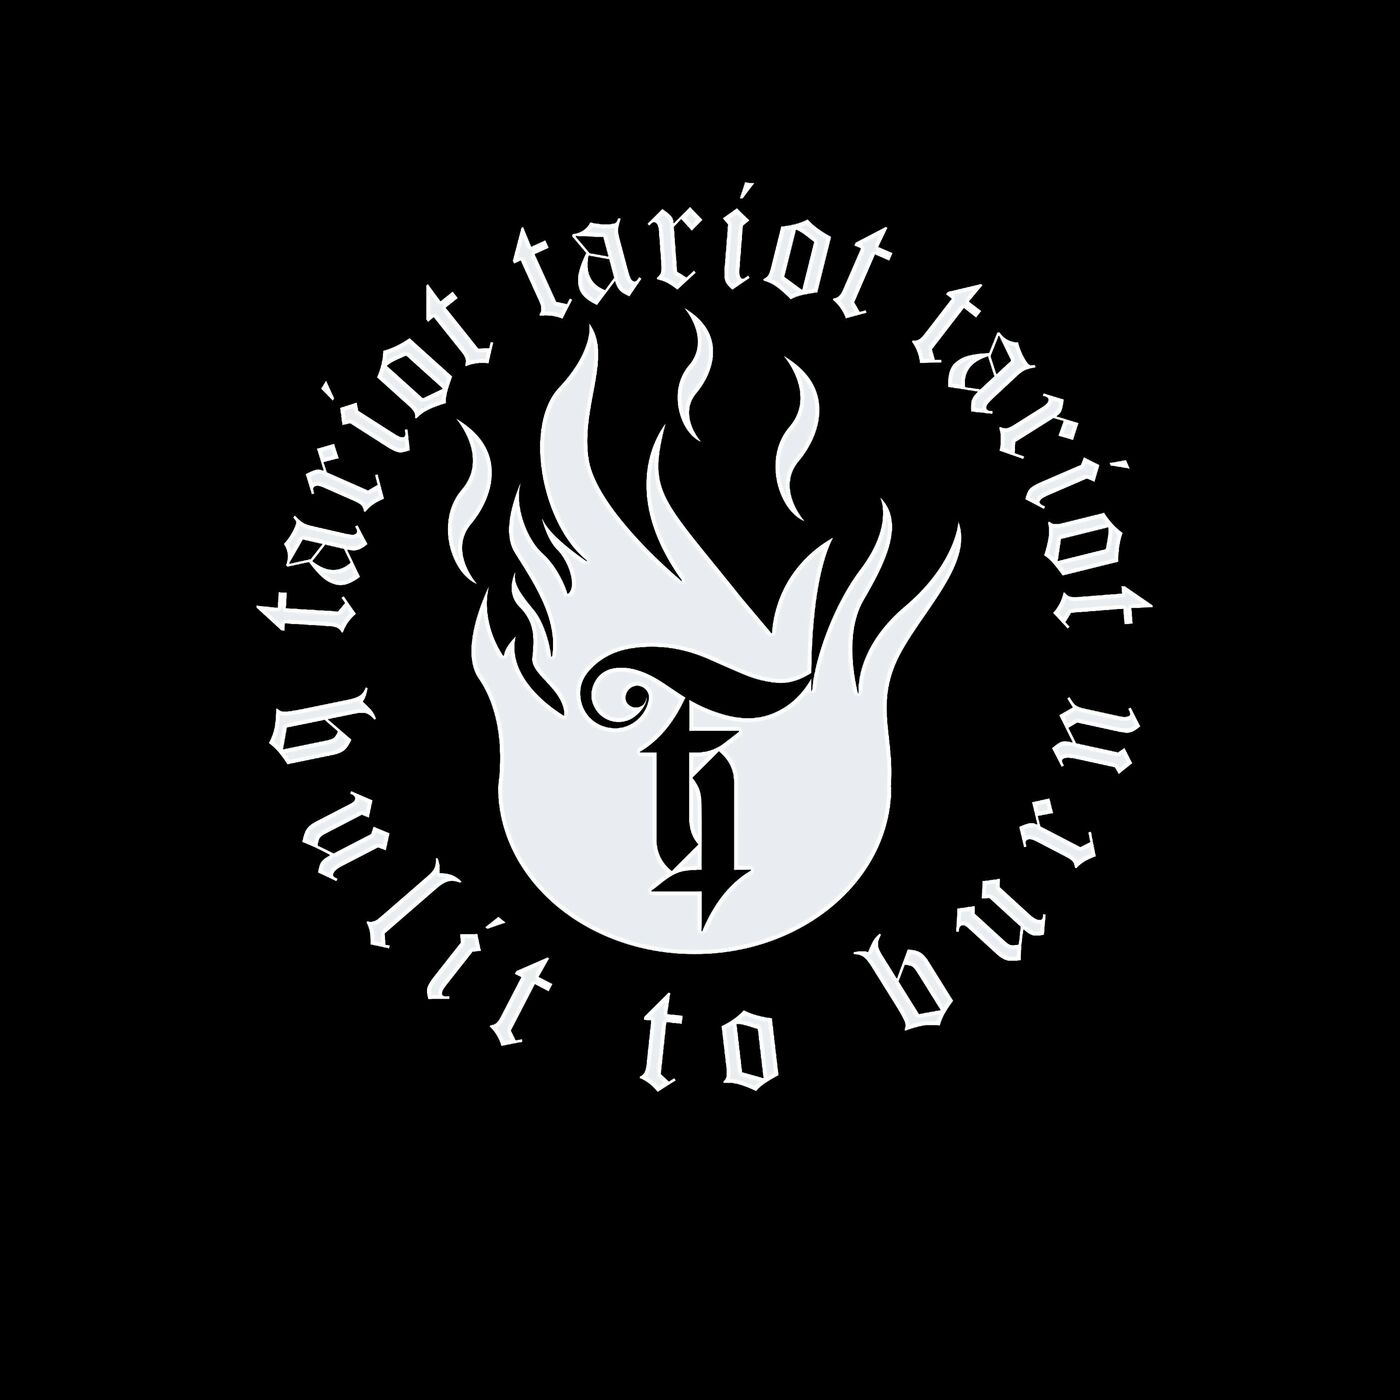 Tariot - Built to Burn [single] (2020)